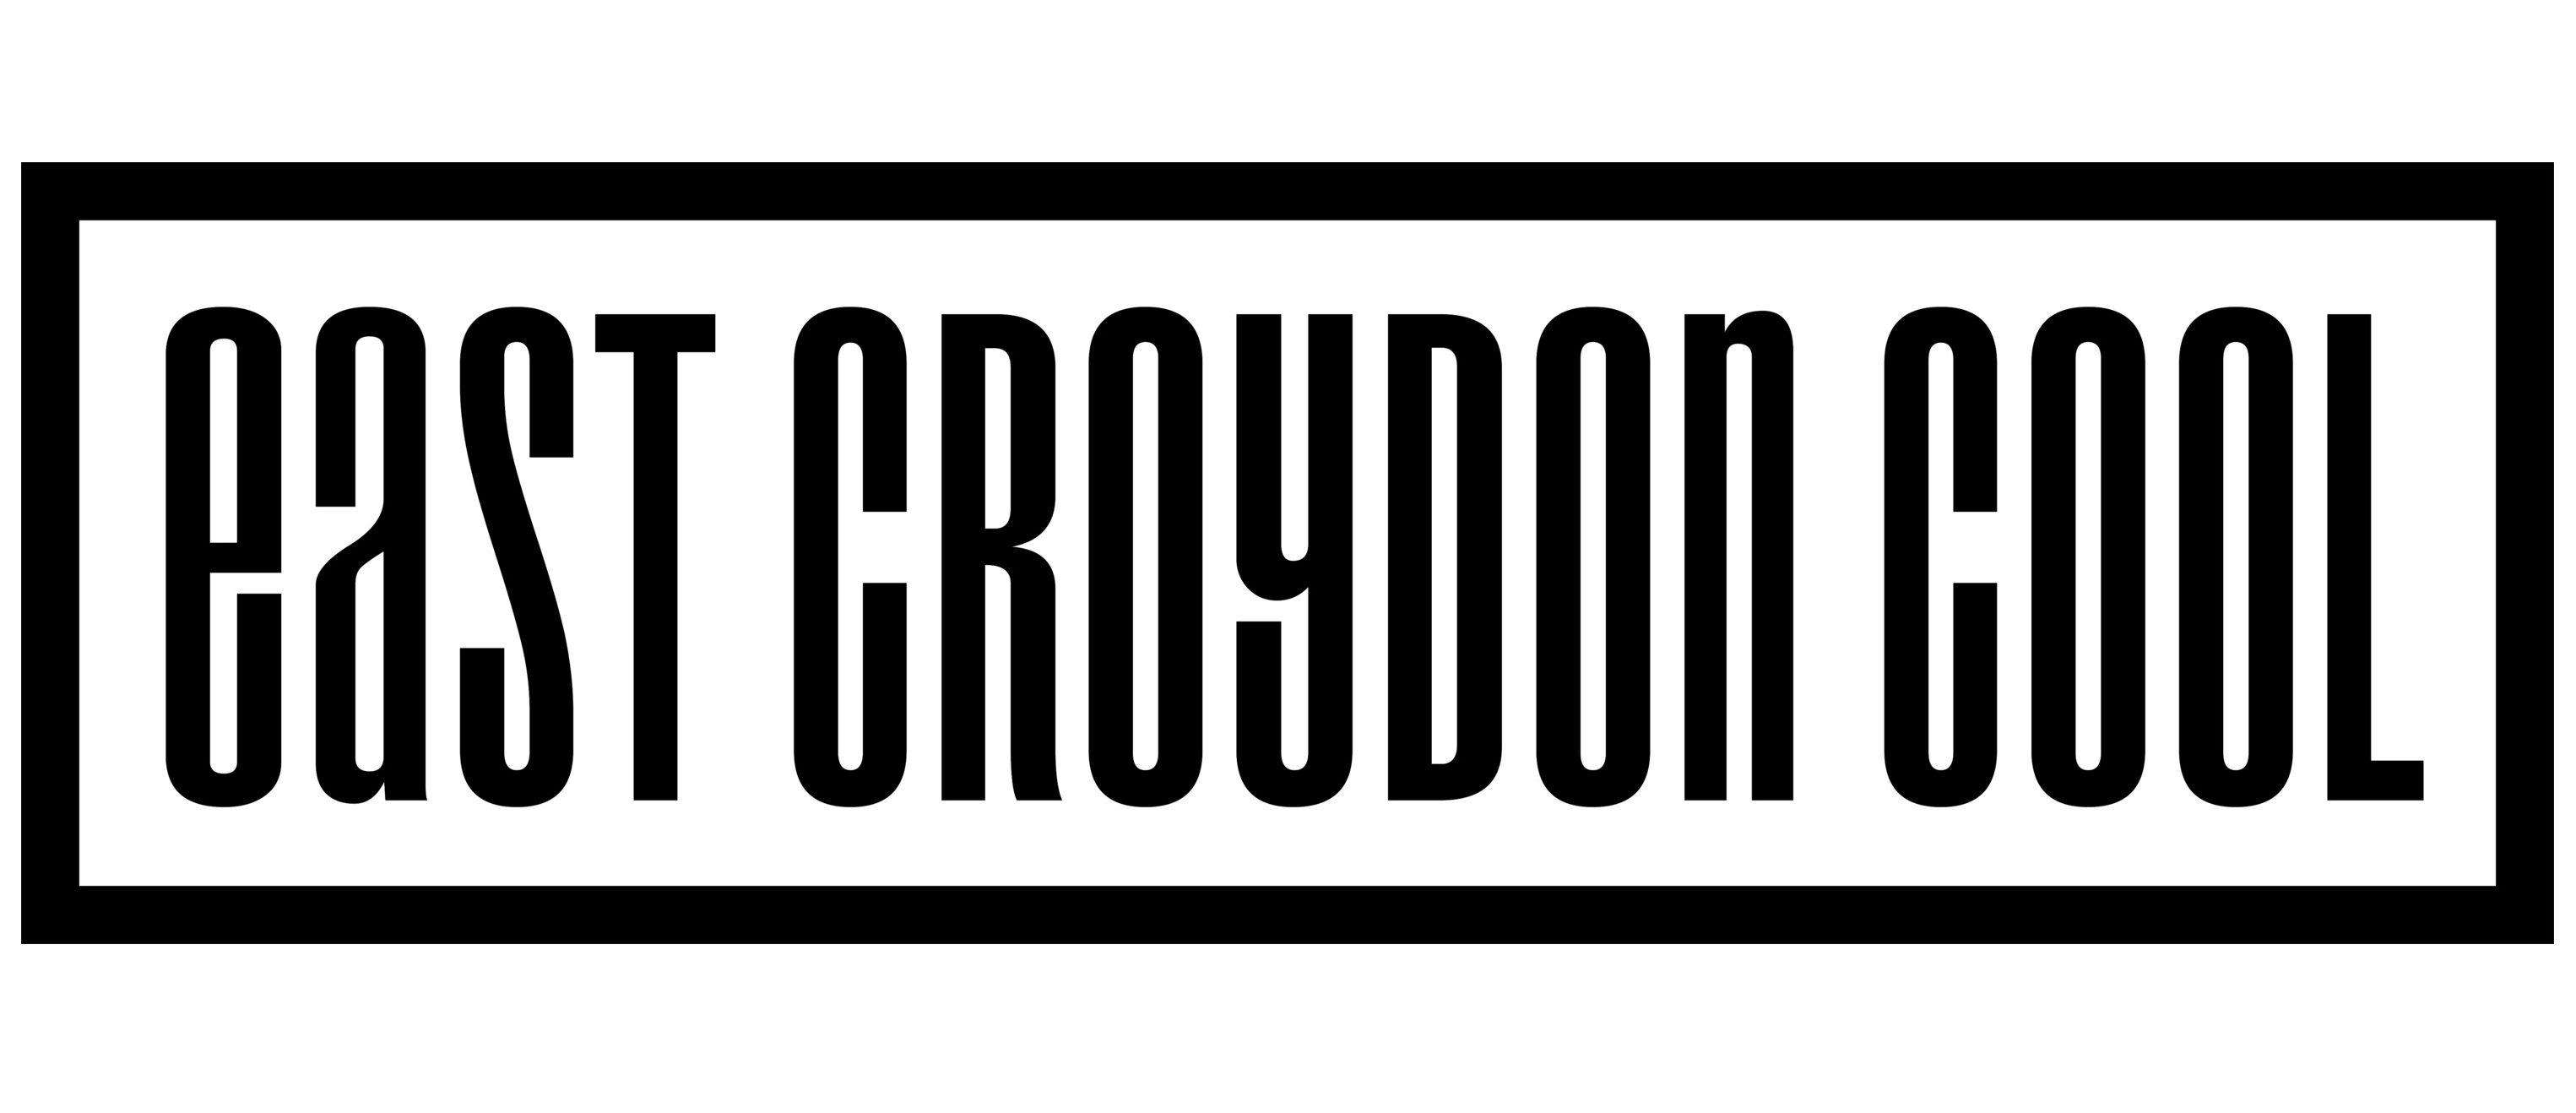 EAST CROYDON COOL